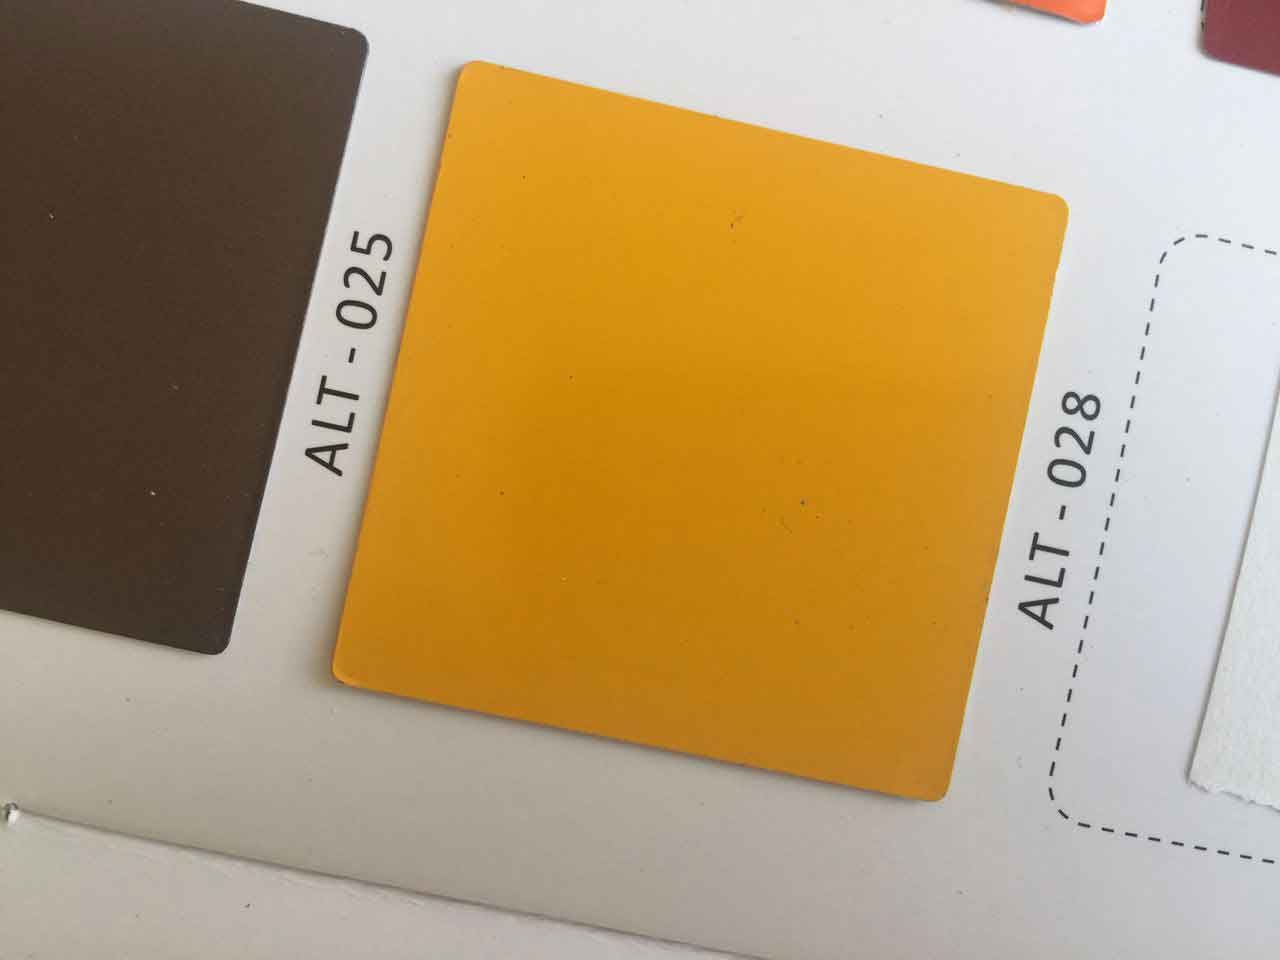 رنگ زرد ورق کامپوزیت با کد ALT-028 آلوتک